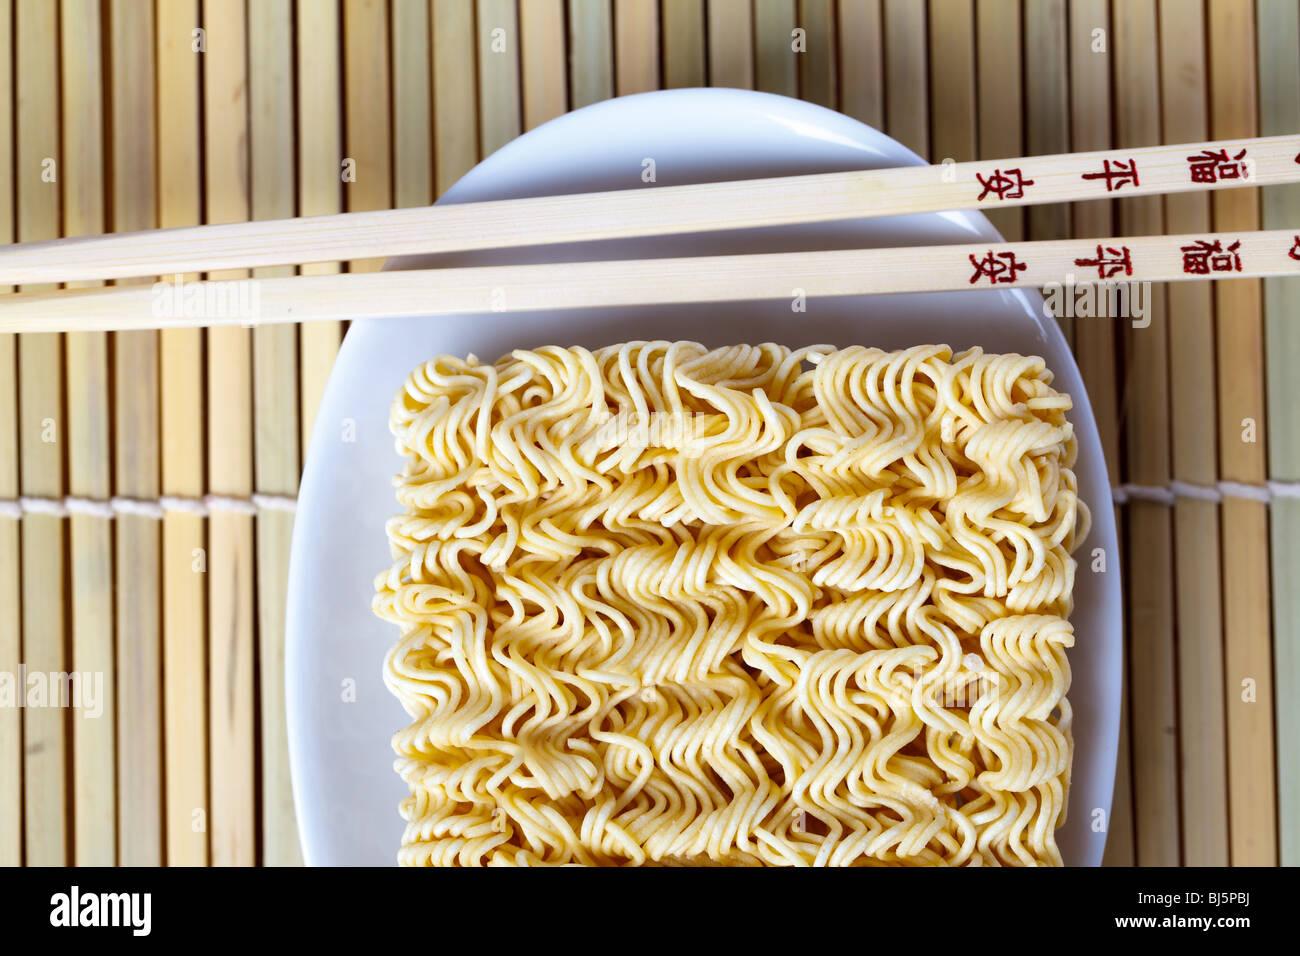 chopsticks and noodles Stock Photo